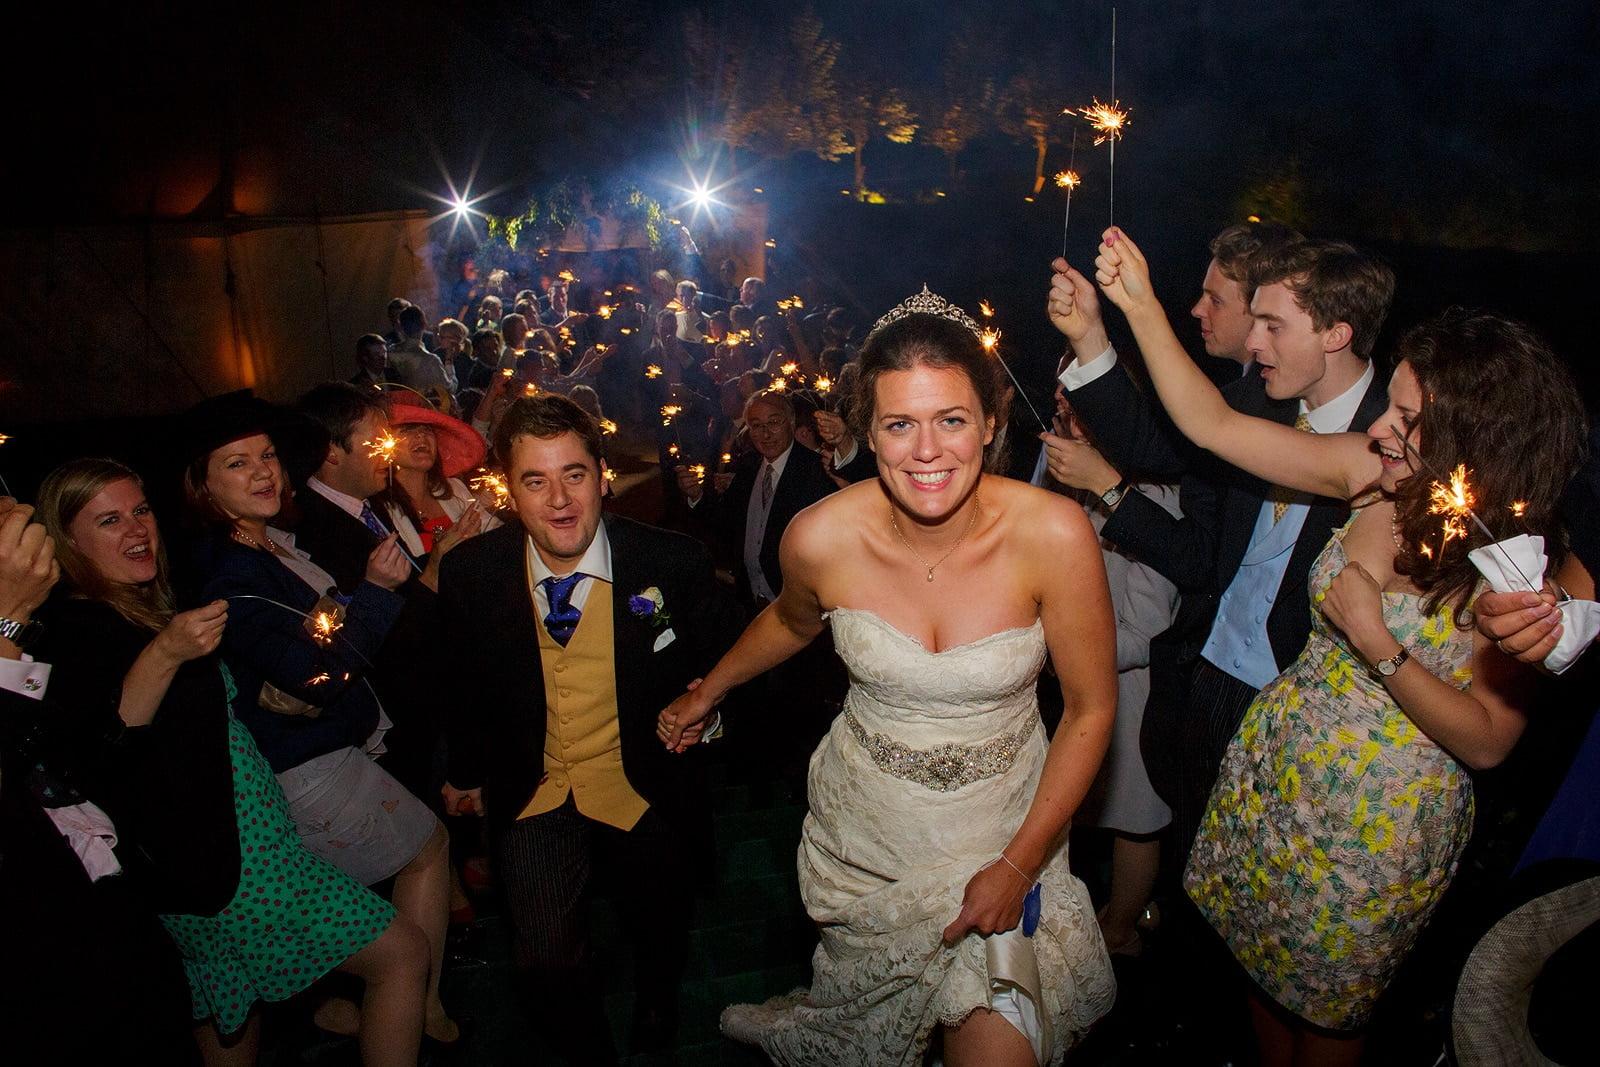 Wedding sparklers | Just One